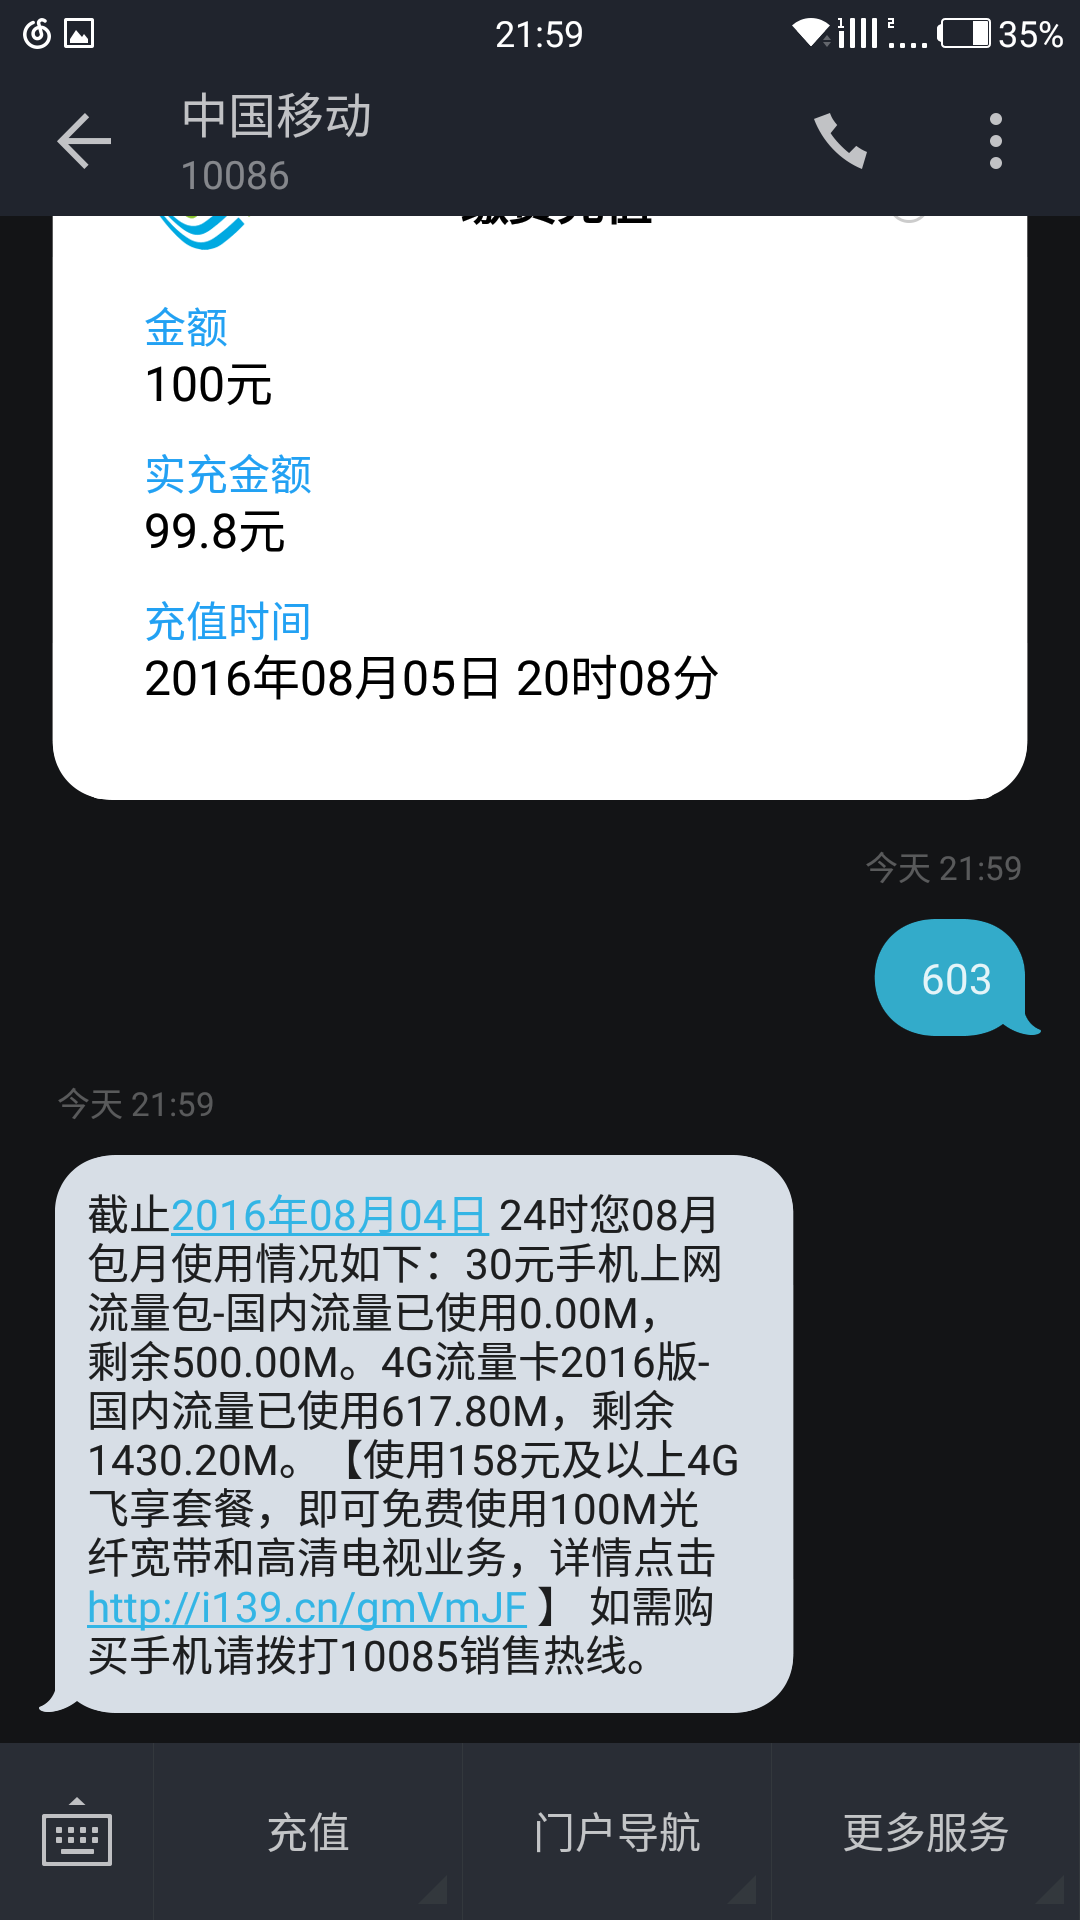 Screenshot_20160805-215959.png